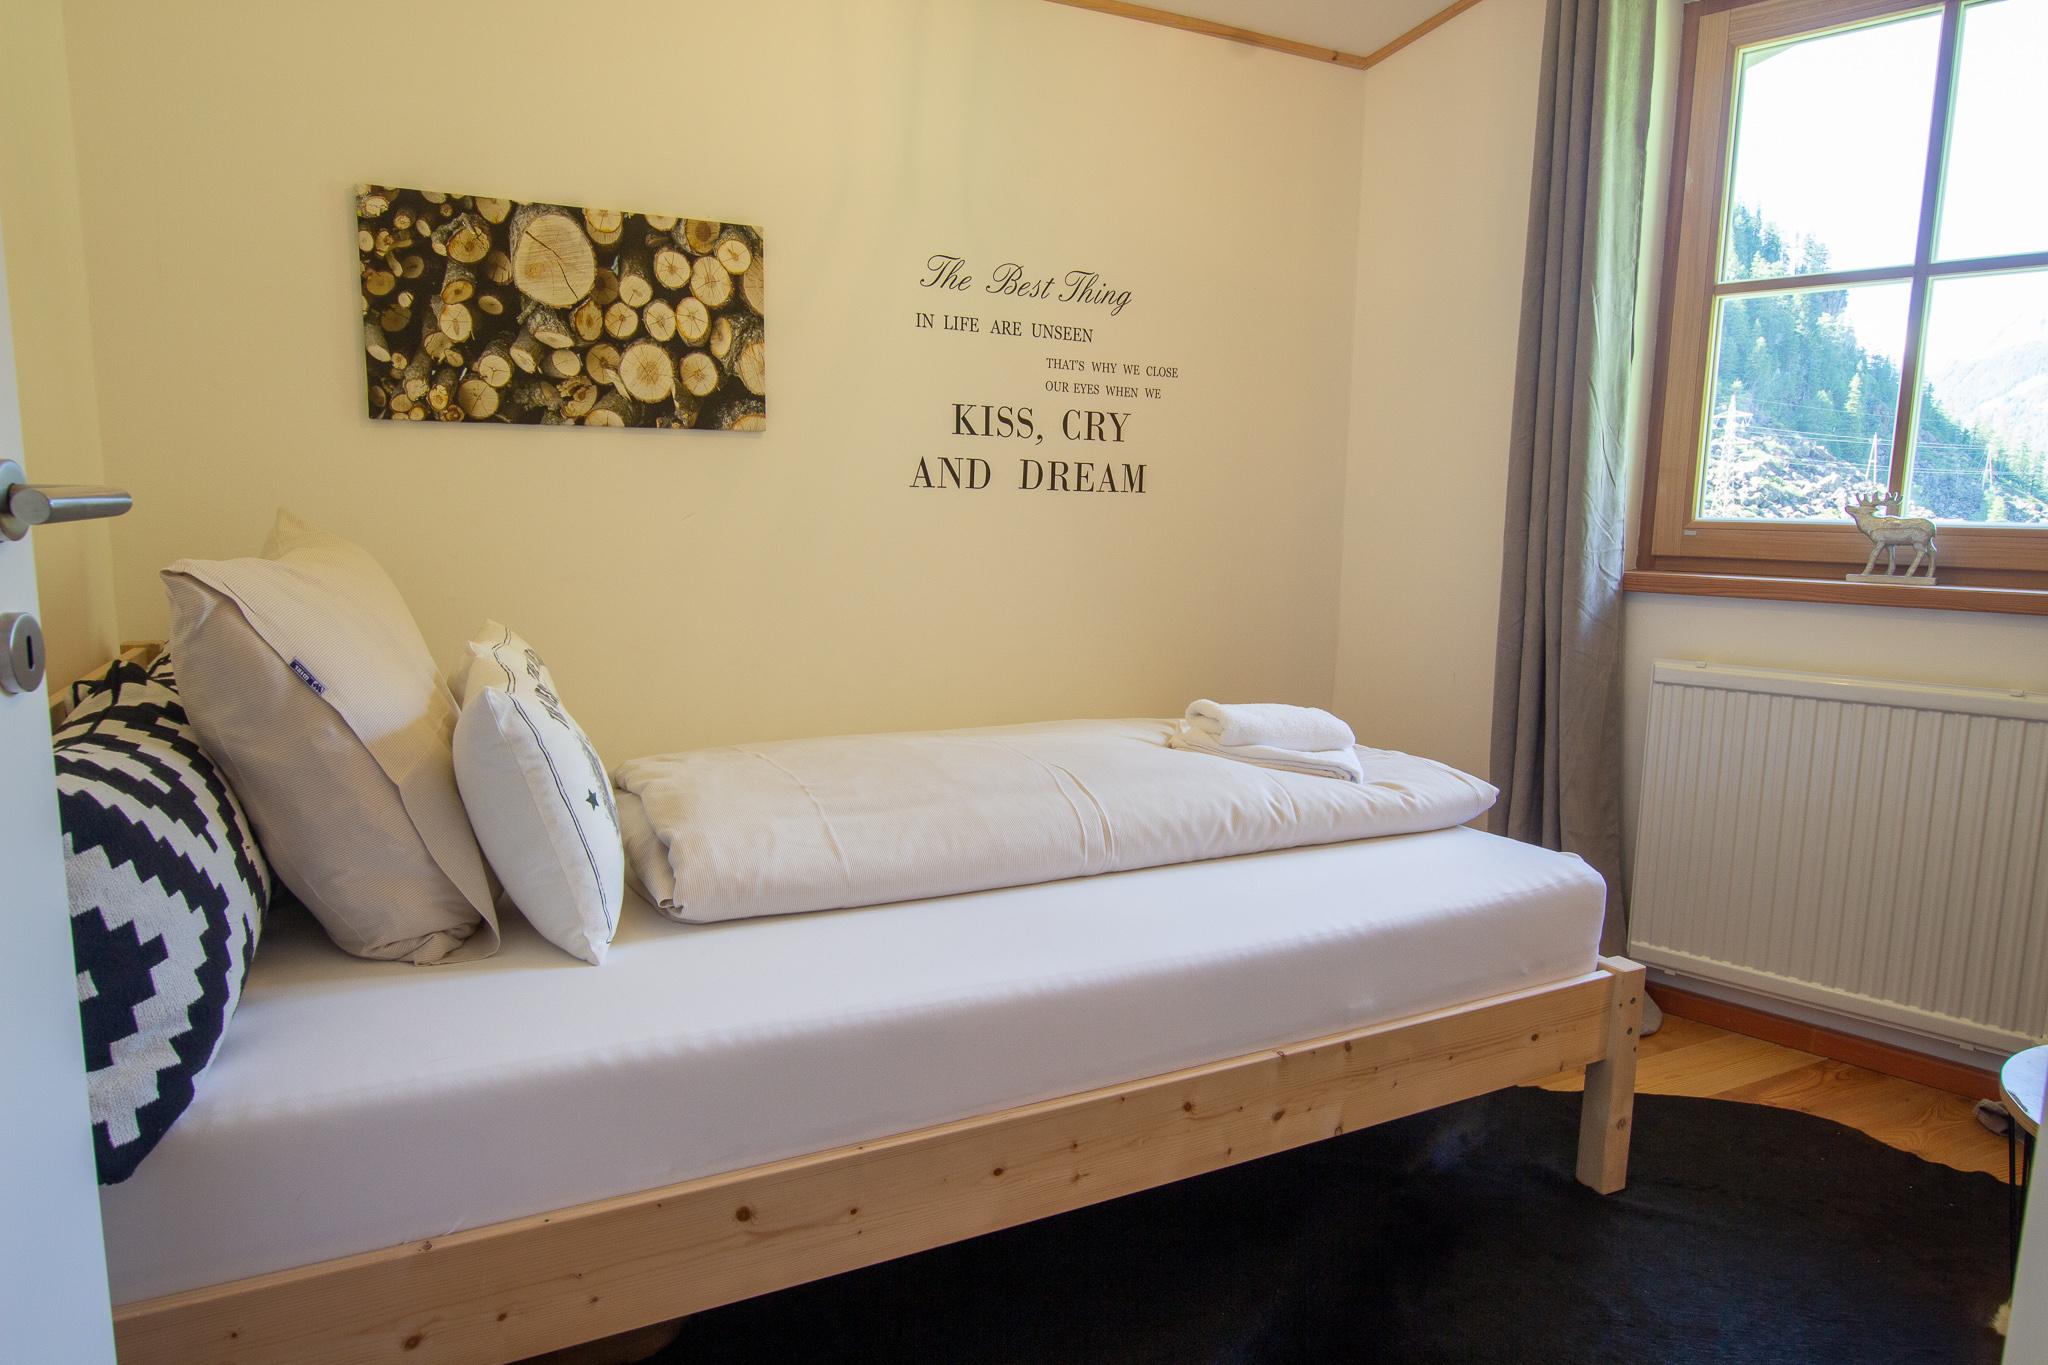 Maison de vacances Lodge Seeblick am Skilift und Bergsee für 5 (2636751), Uttendorf, Pinzgau, Salzbourg, Autriche, image 14